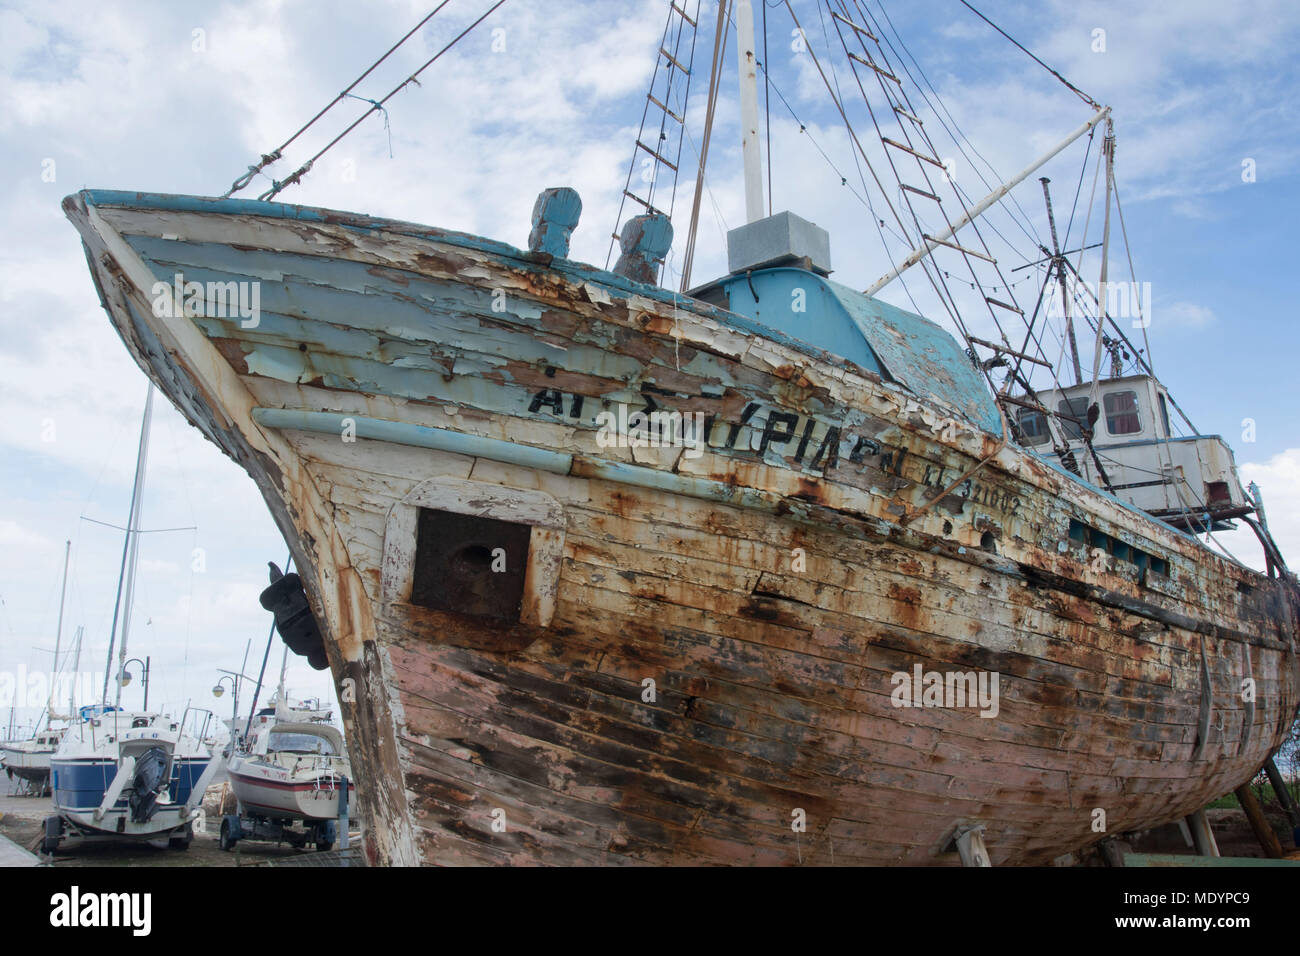 Wooden ship in need of repair, dry dock, Polis, Cyprus - Stock Image